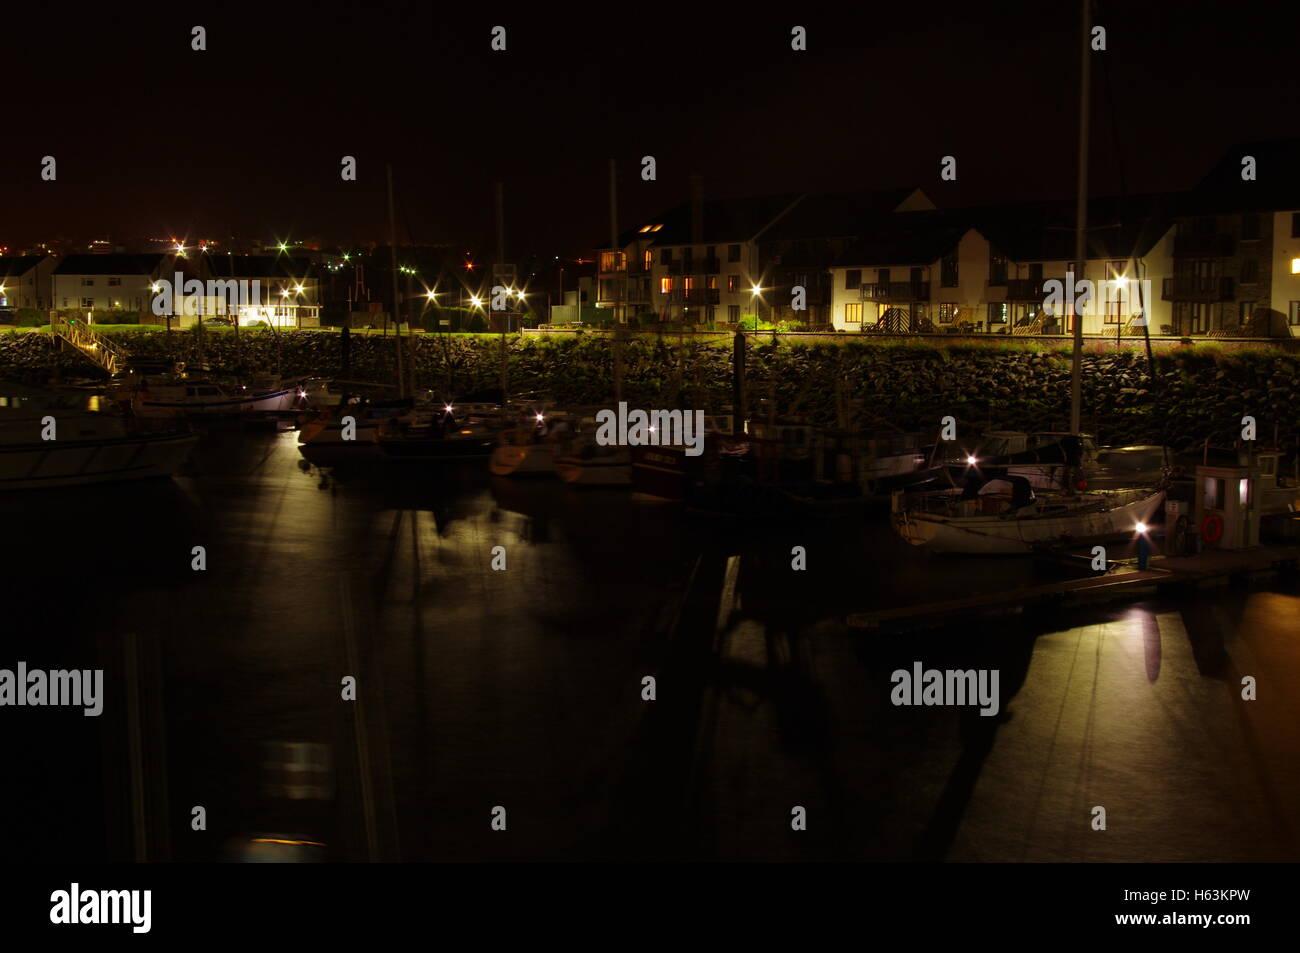 View overlooking Aberystwyth Harbour / Marina at night facing towards Y Lanfa Trefechen, shot taken with long exposure. - Stock Image